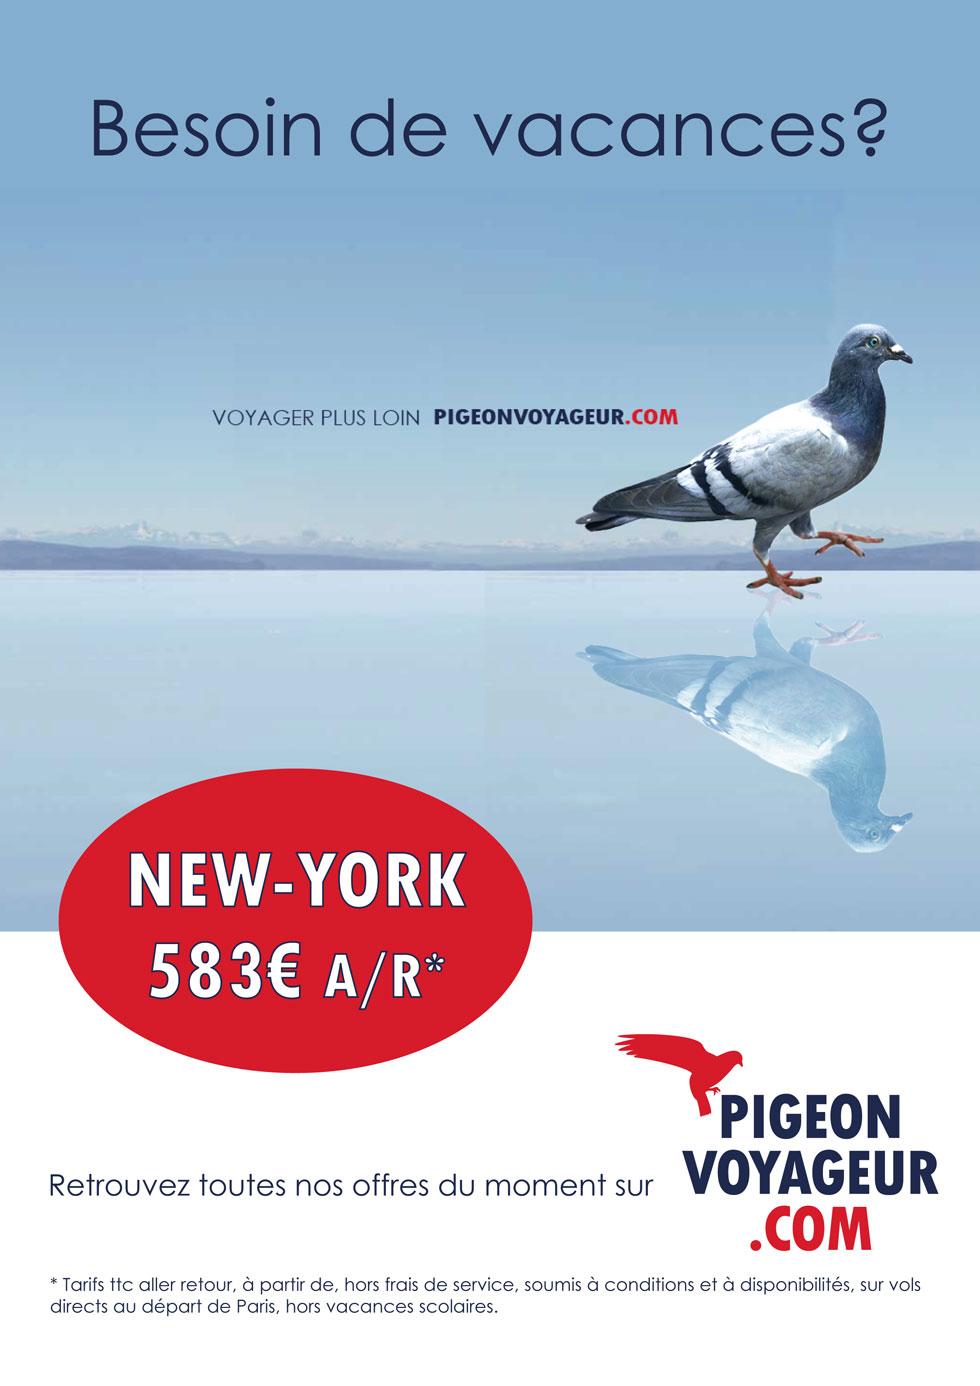 Pigeonvoyageur.com